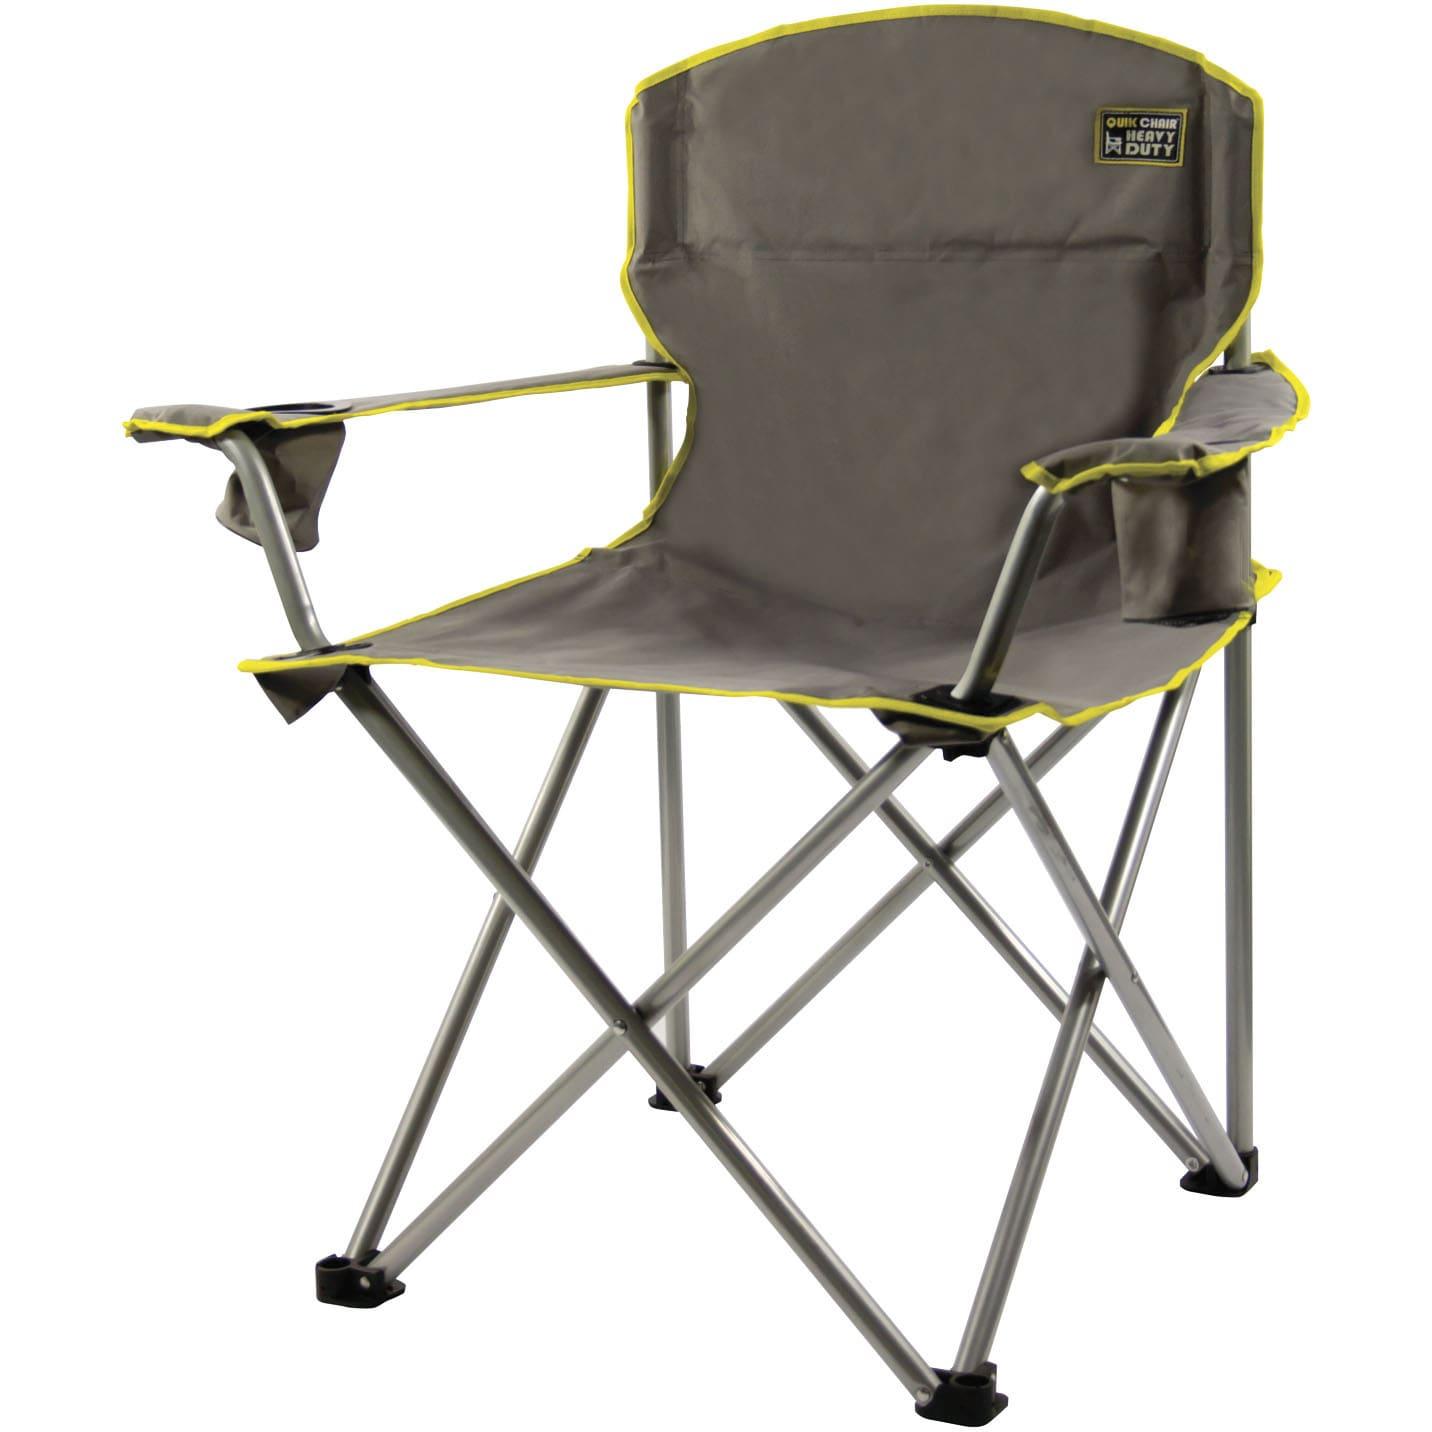 Quik Chair Quarter Ton Heavy Duty Folding Armchair